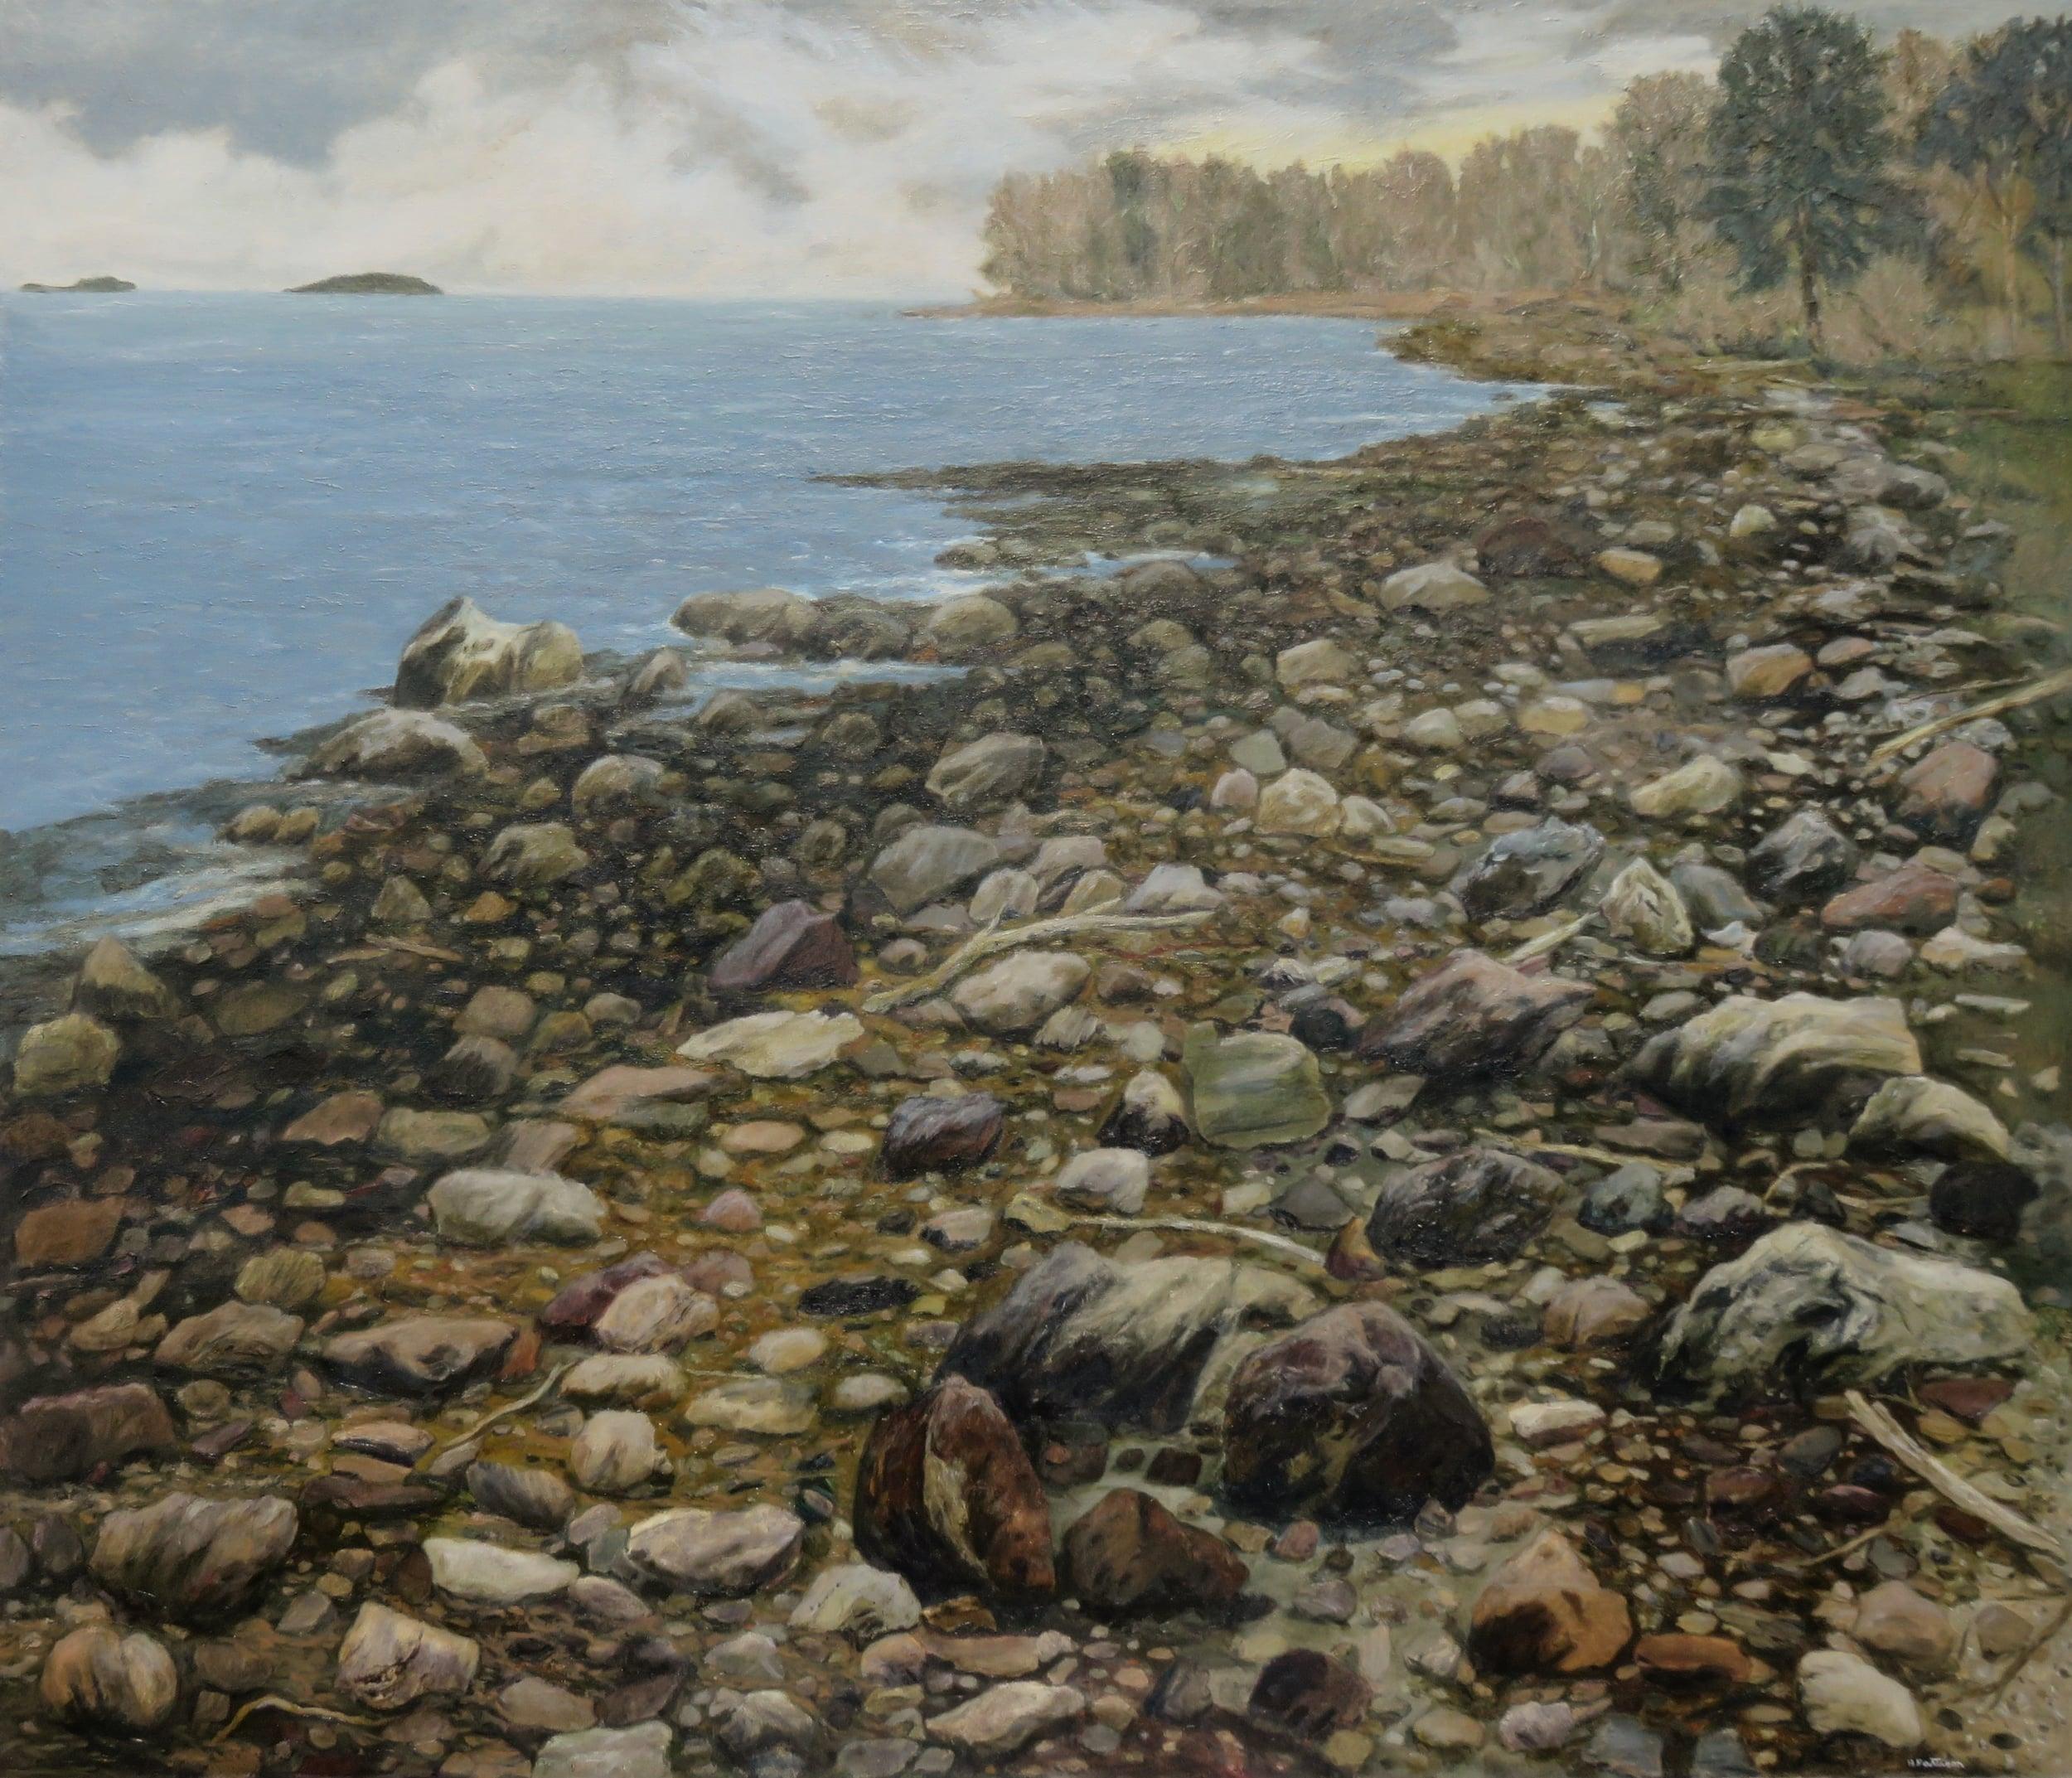 The Coastal Shoreline, oil on canvas, 50 x 58 inches